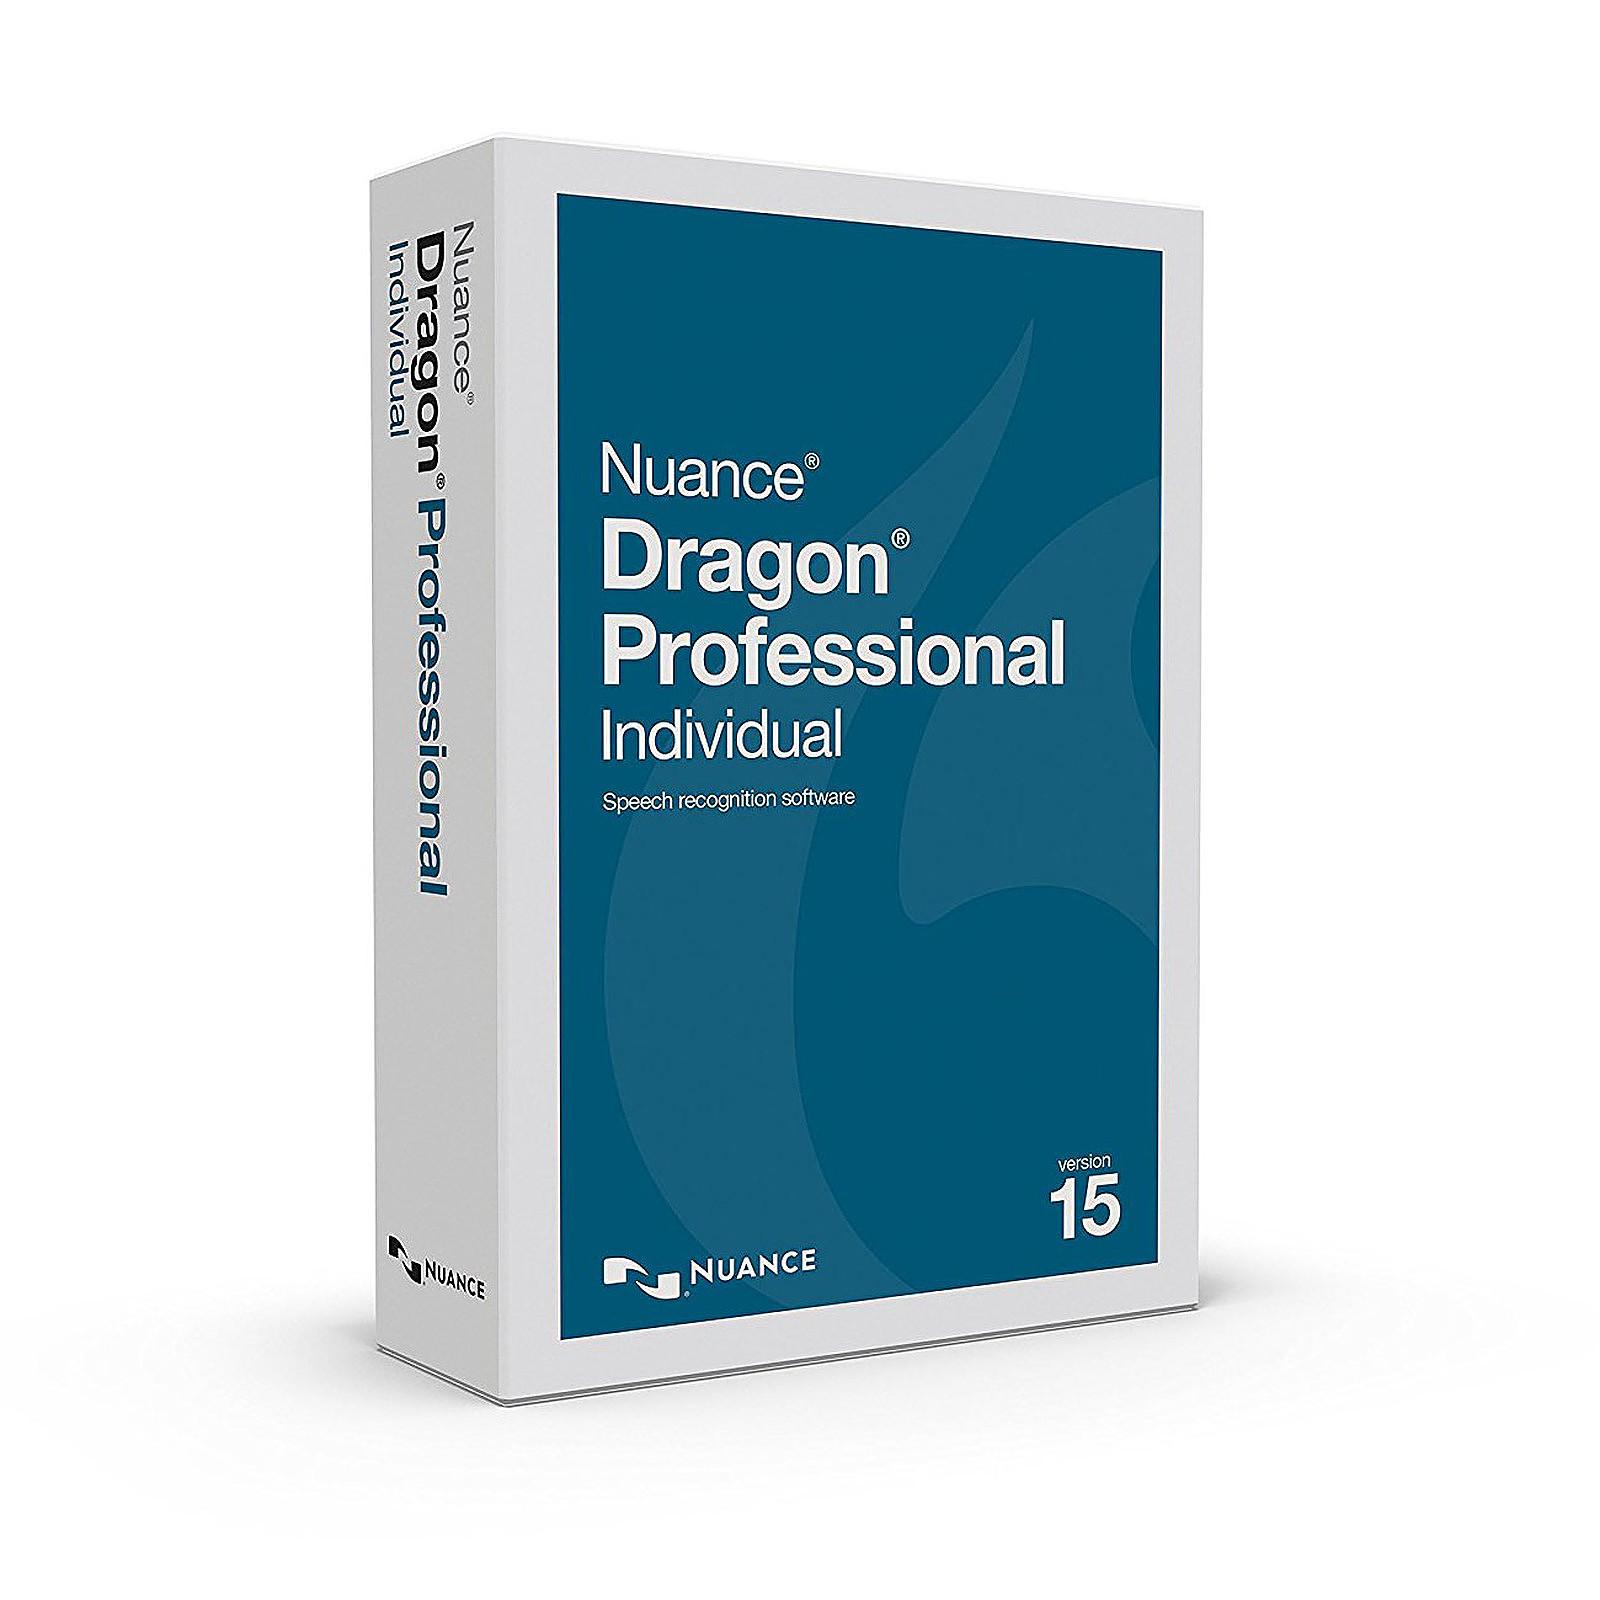 Nuance Dragon Professional Individual v15